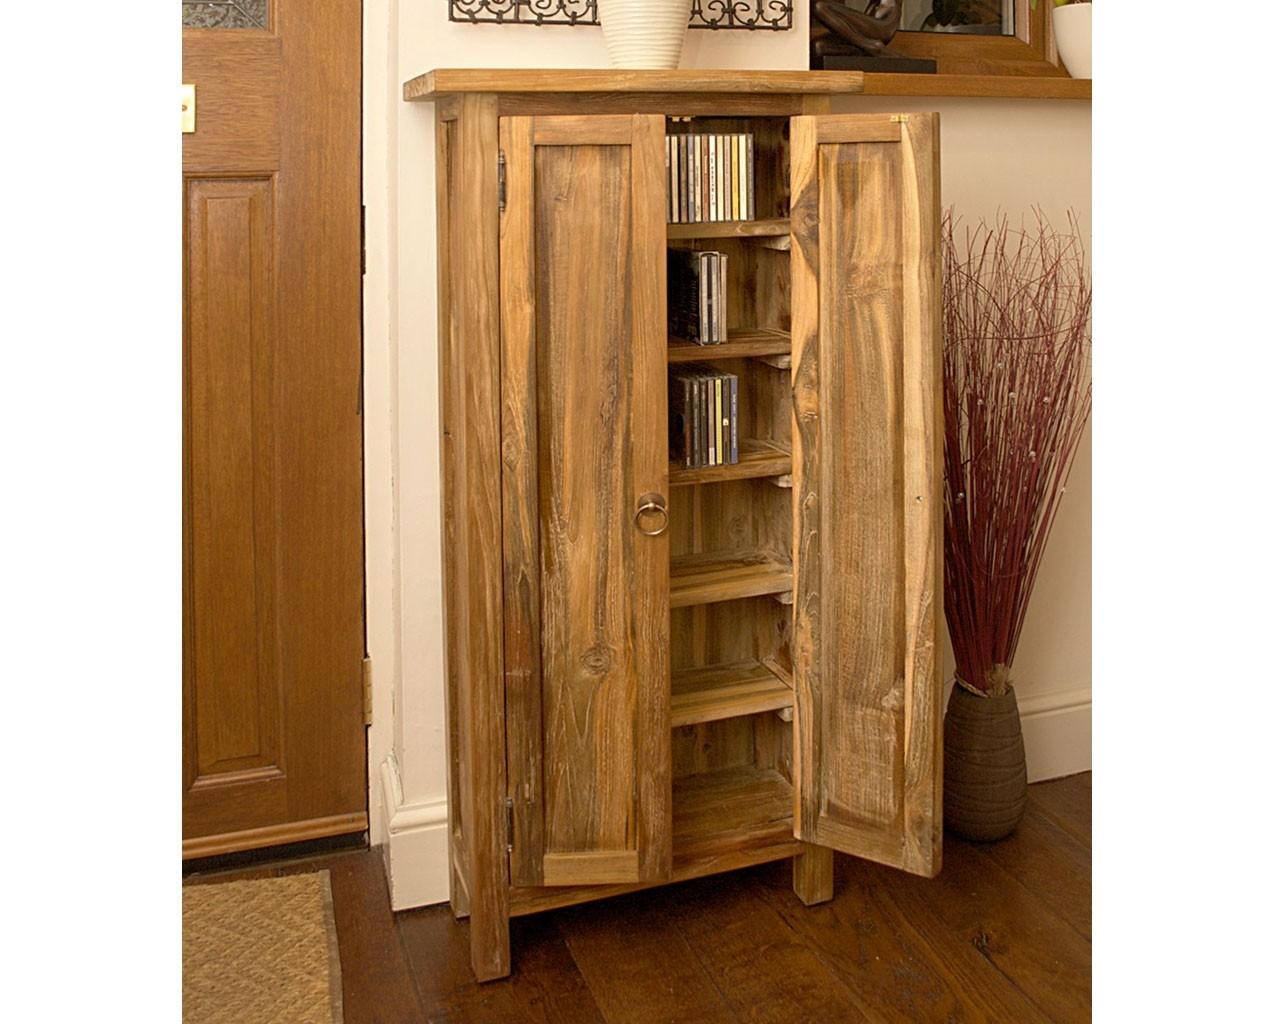 Teak Cd Storage Cupboard Rustic Storage Puji Furniture With Regard To Bespoke Cd Storage (View 13 of 15)